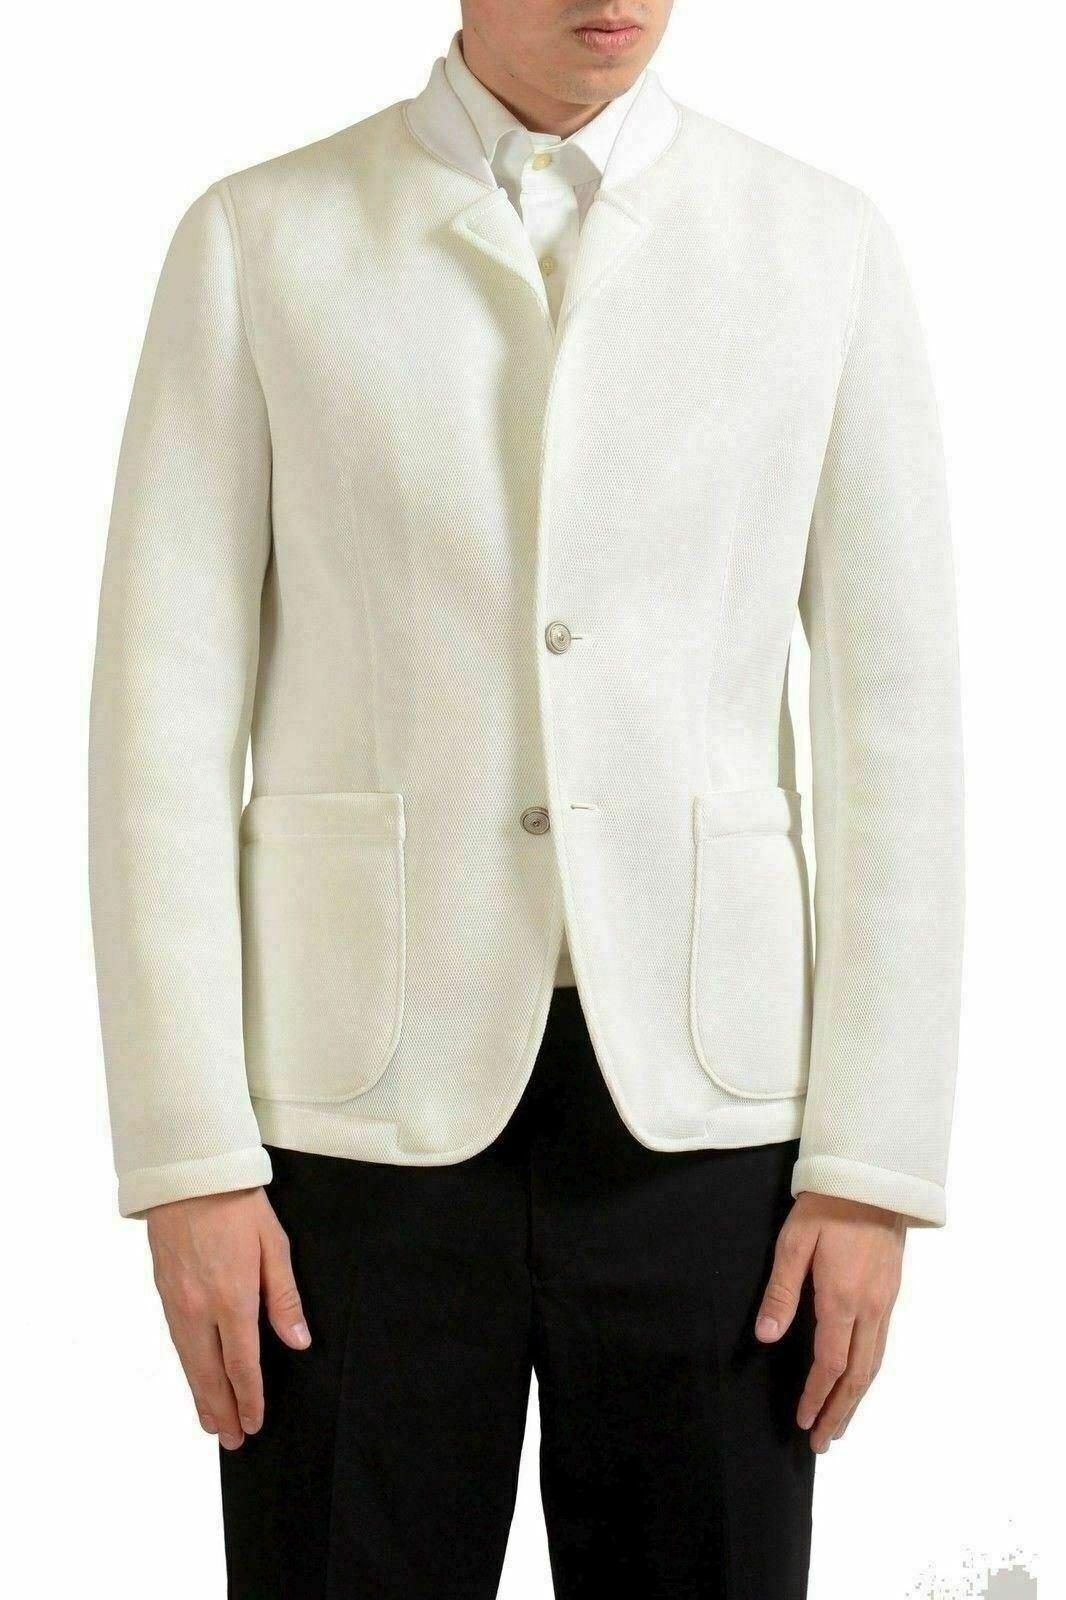 Just Cavalli Men's Two Button White Blazer Sport Coat US 38 IT 48